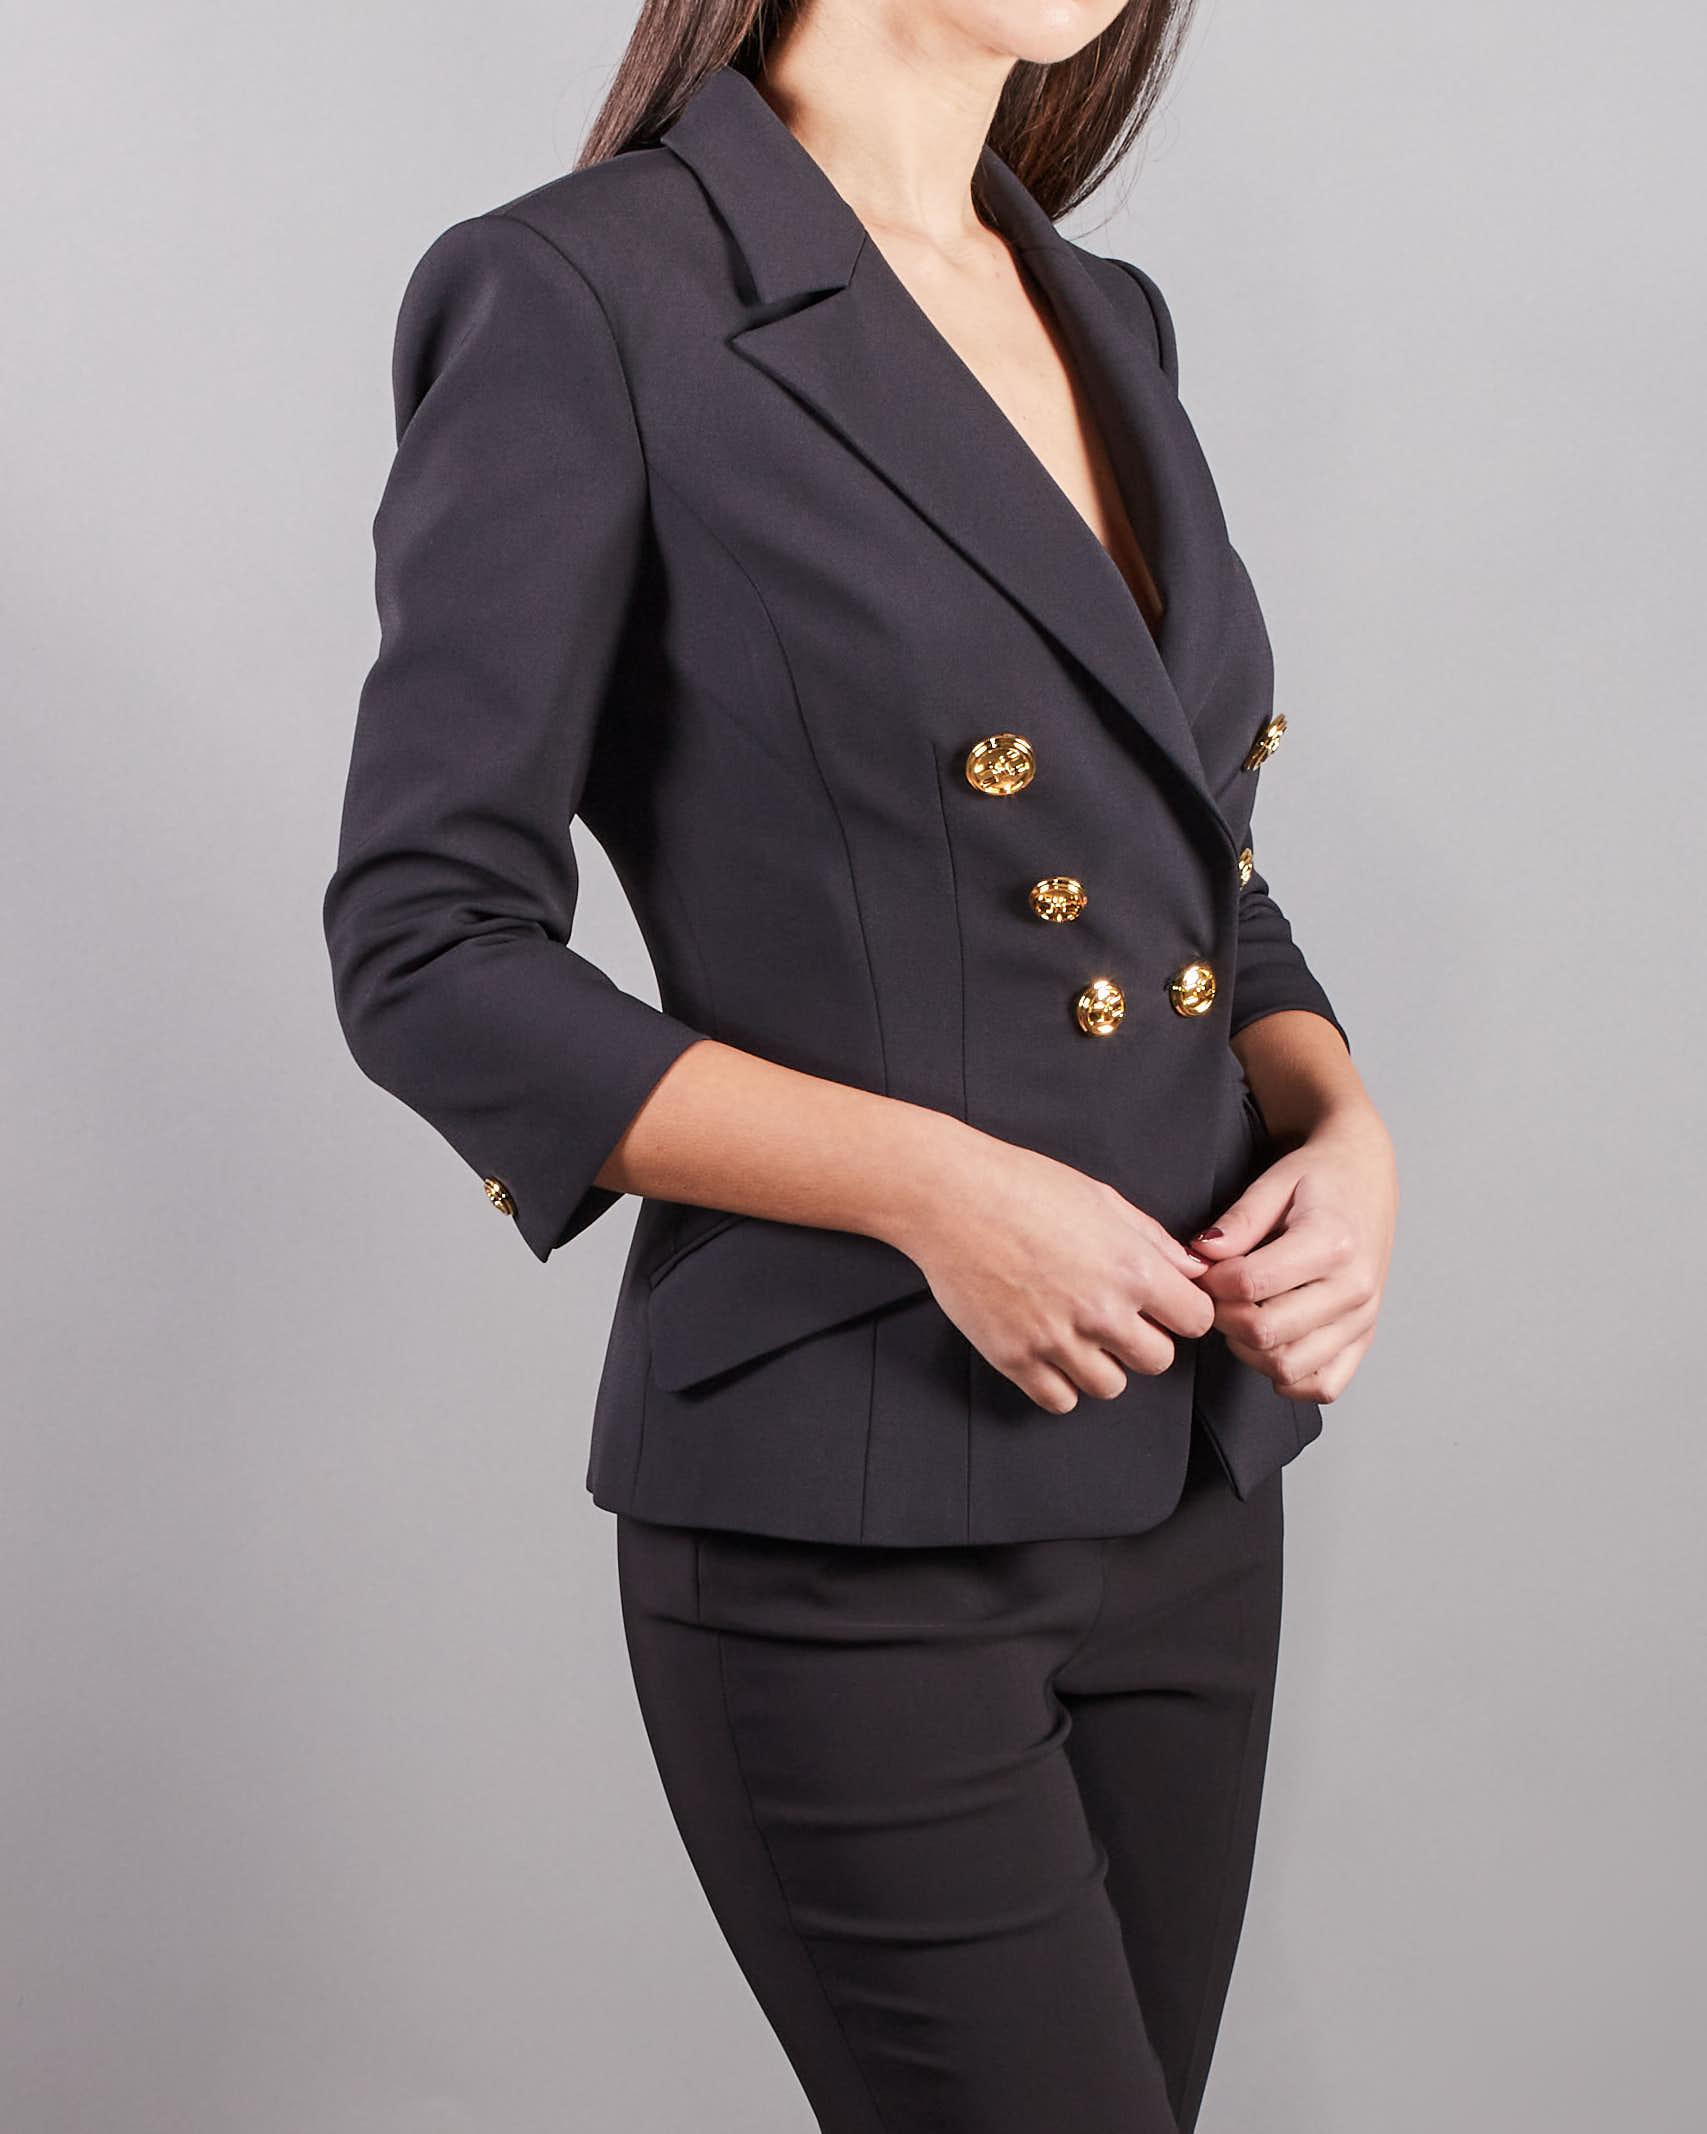 Giacca corta con bottoni oro light Elisabetta Franchi ELISABETTA FRANCHI | Giacca | GI97011E2110